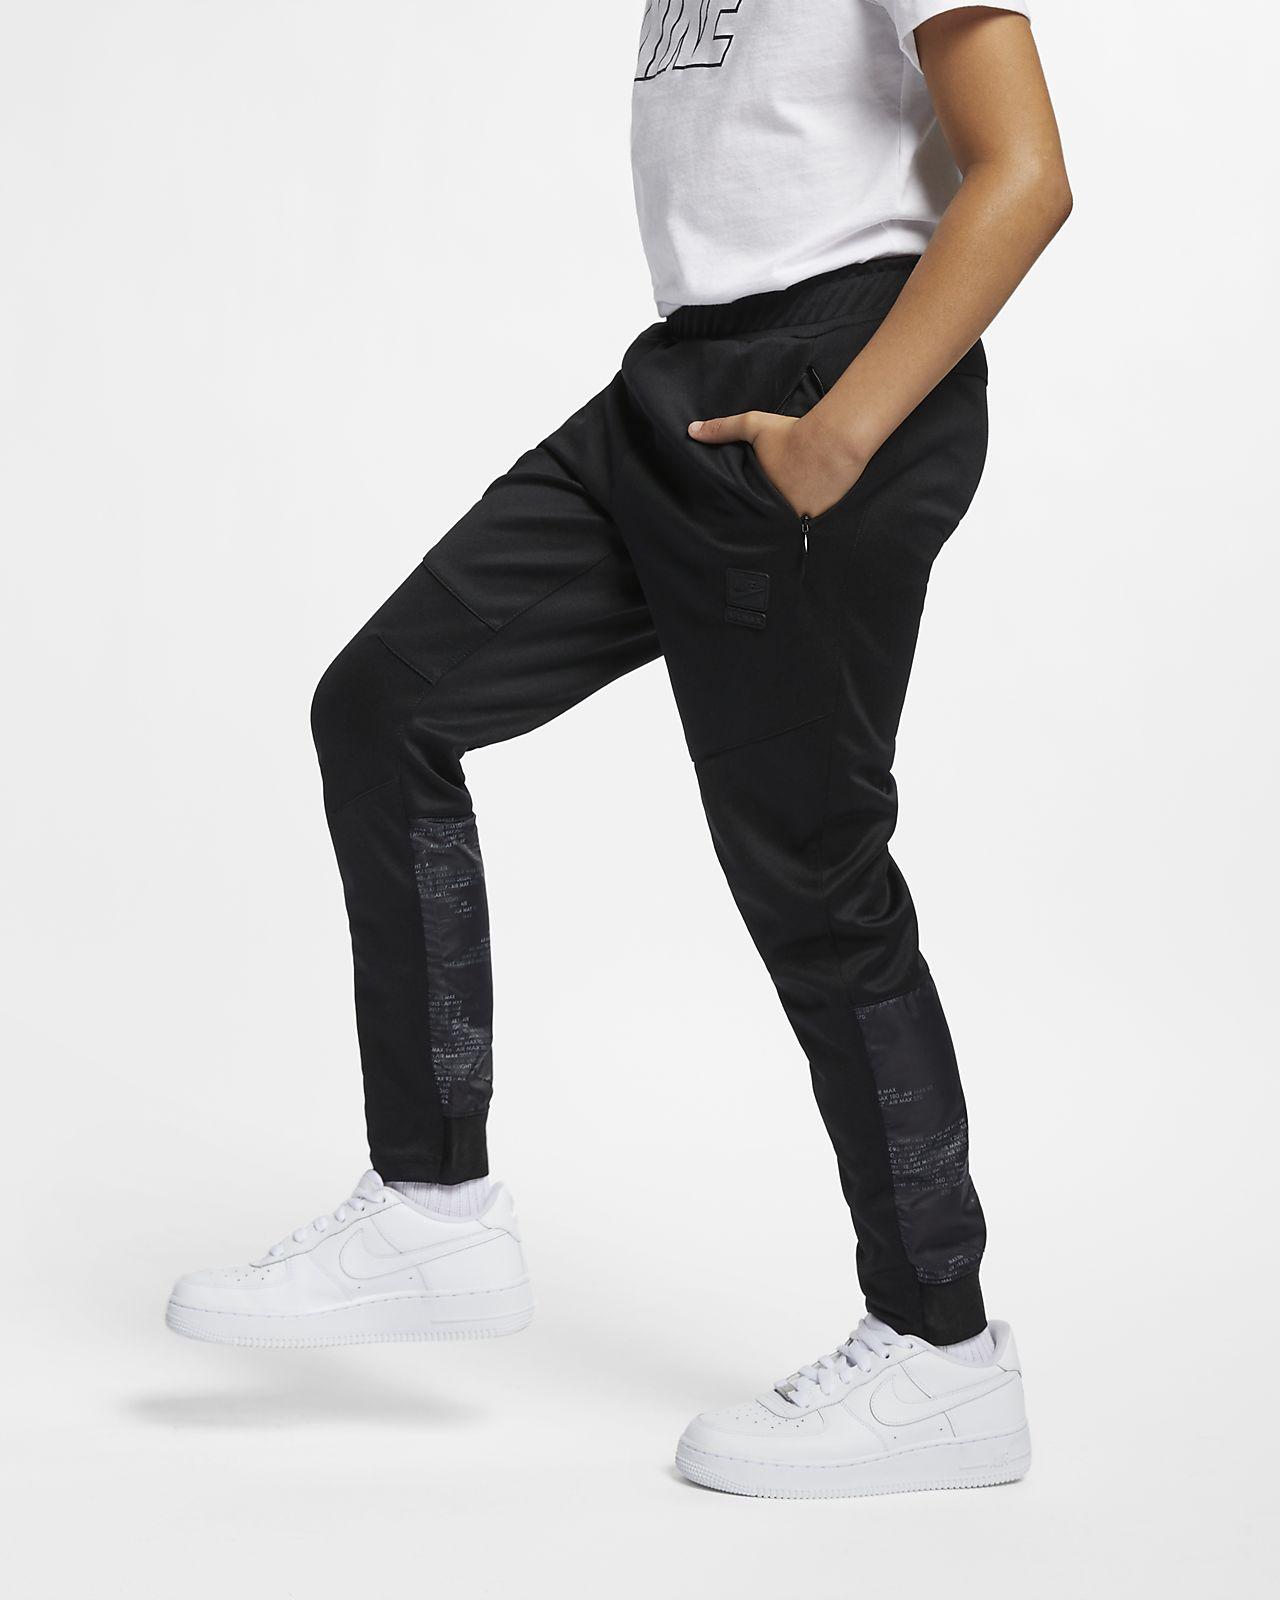 9aa63e43e1a Pantalon de jogging Nike Sportswear pour Garçon plus âgé. Nike.com FR